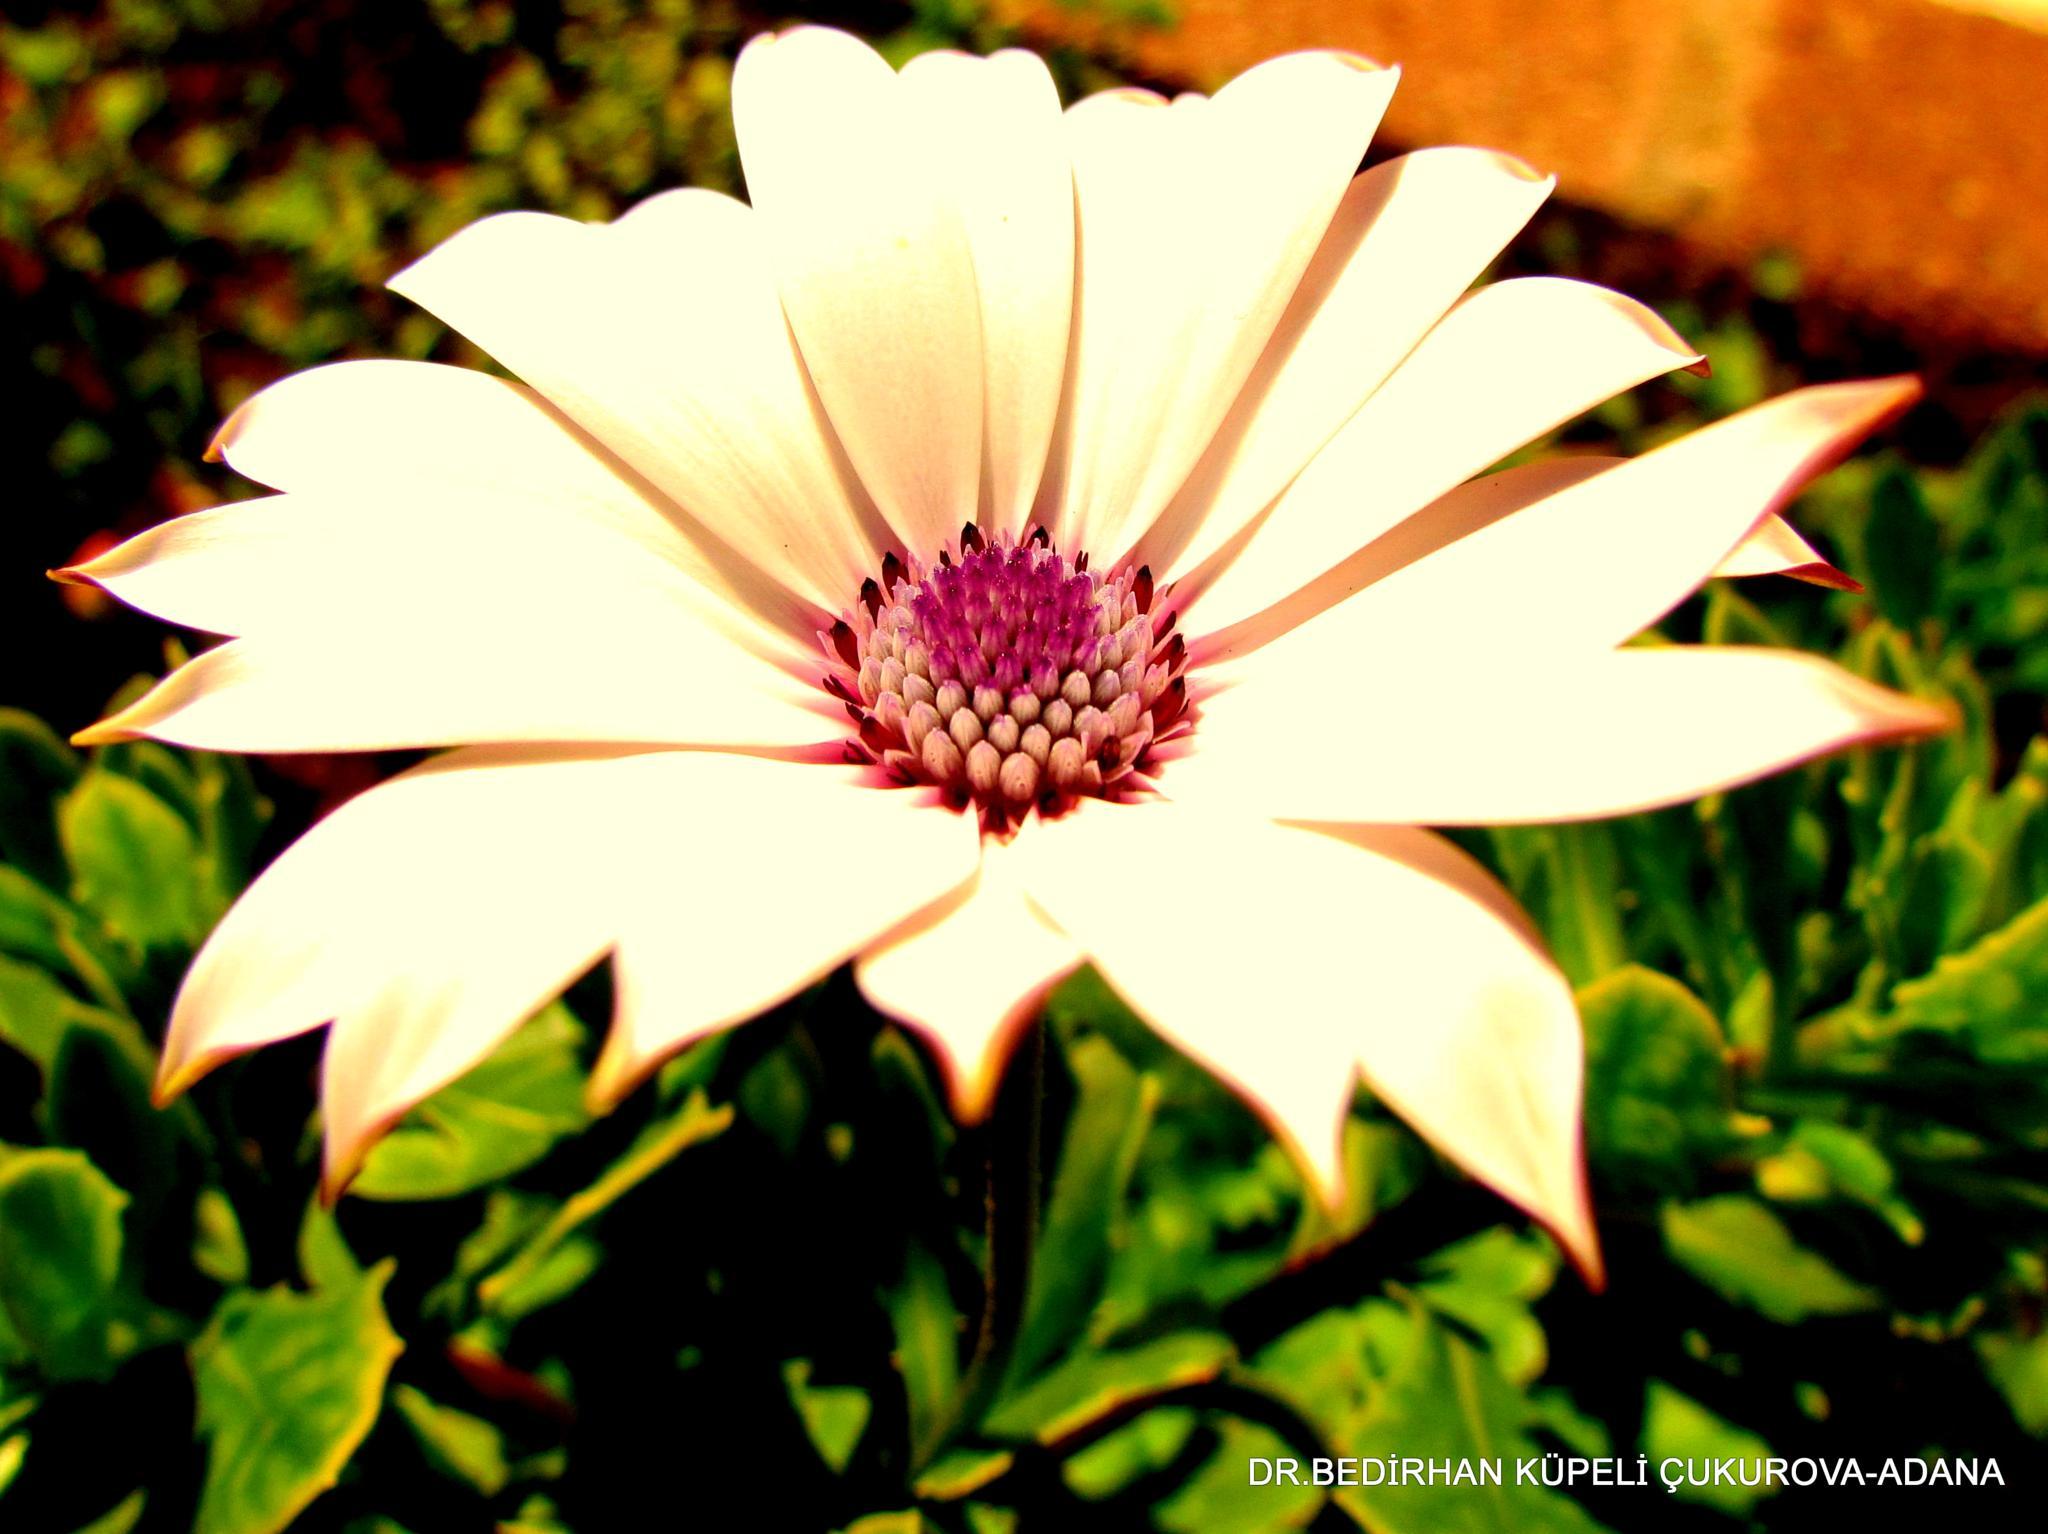 Giant Daisy by Bedirhan Küpeli